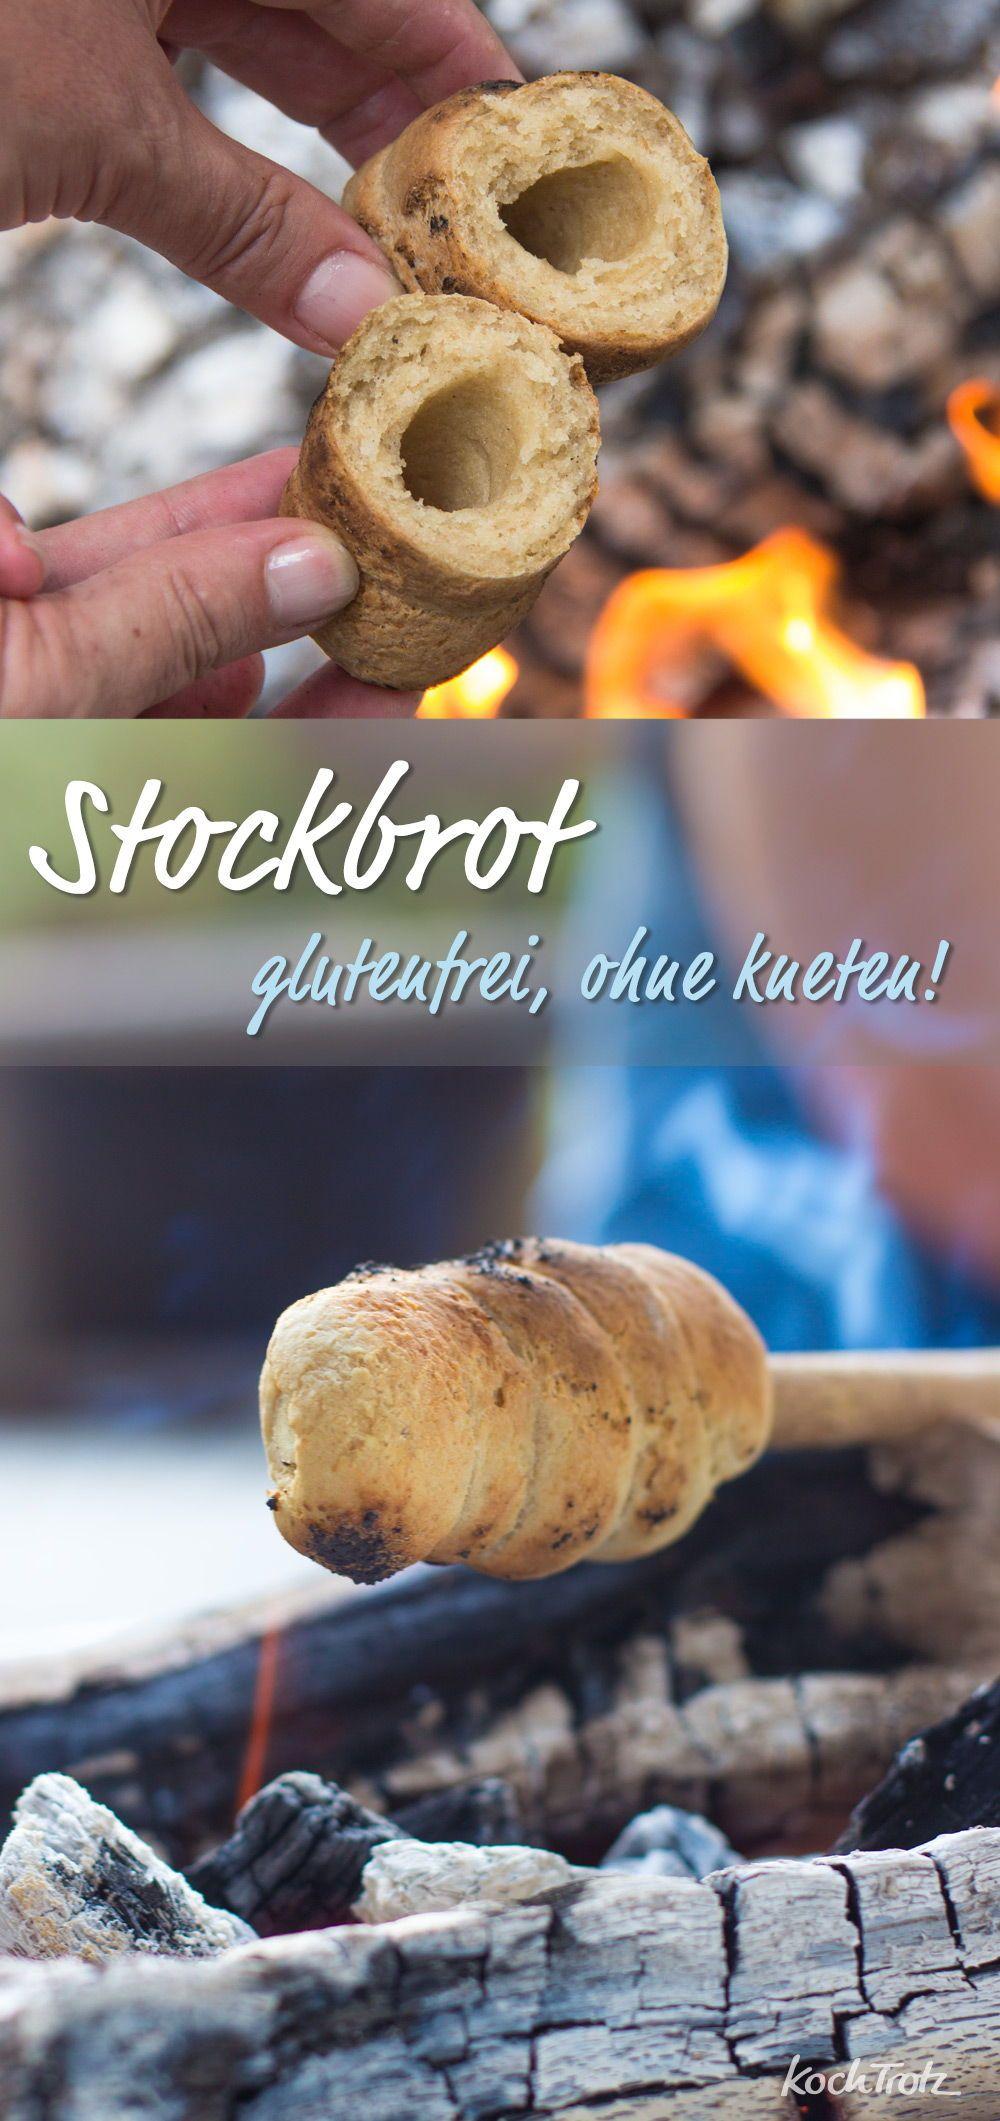 Glutenfreies Stockbrot | ohne Kneten | mit wenig Hefe - KochTrotz | kreative Rezepte #glutenfreierezepte